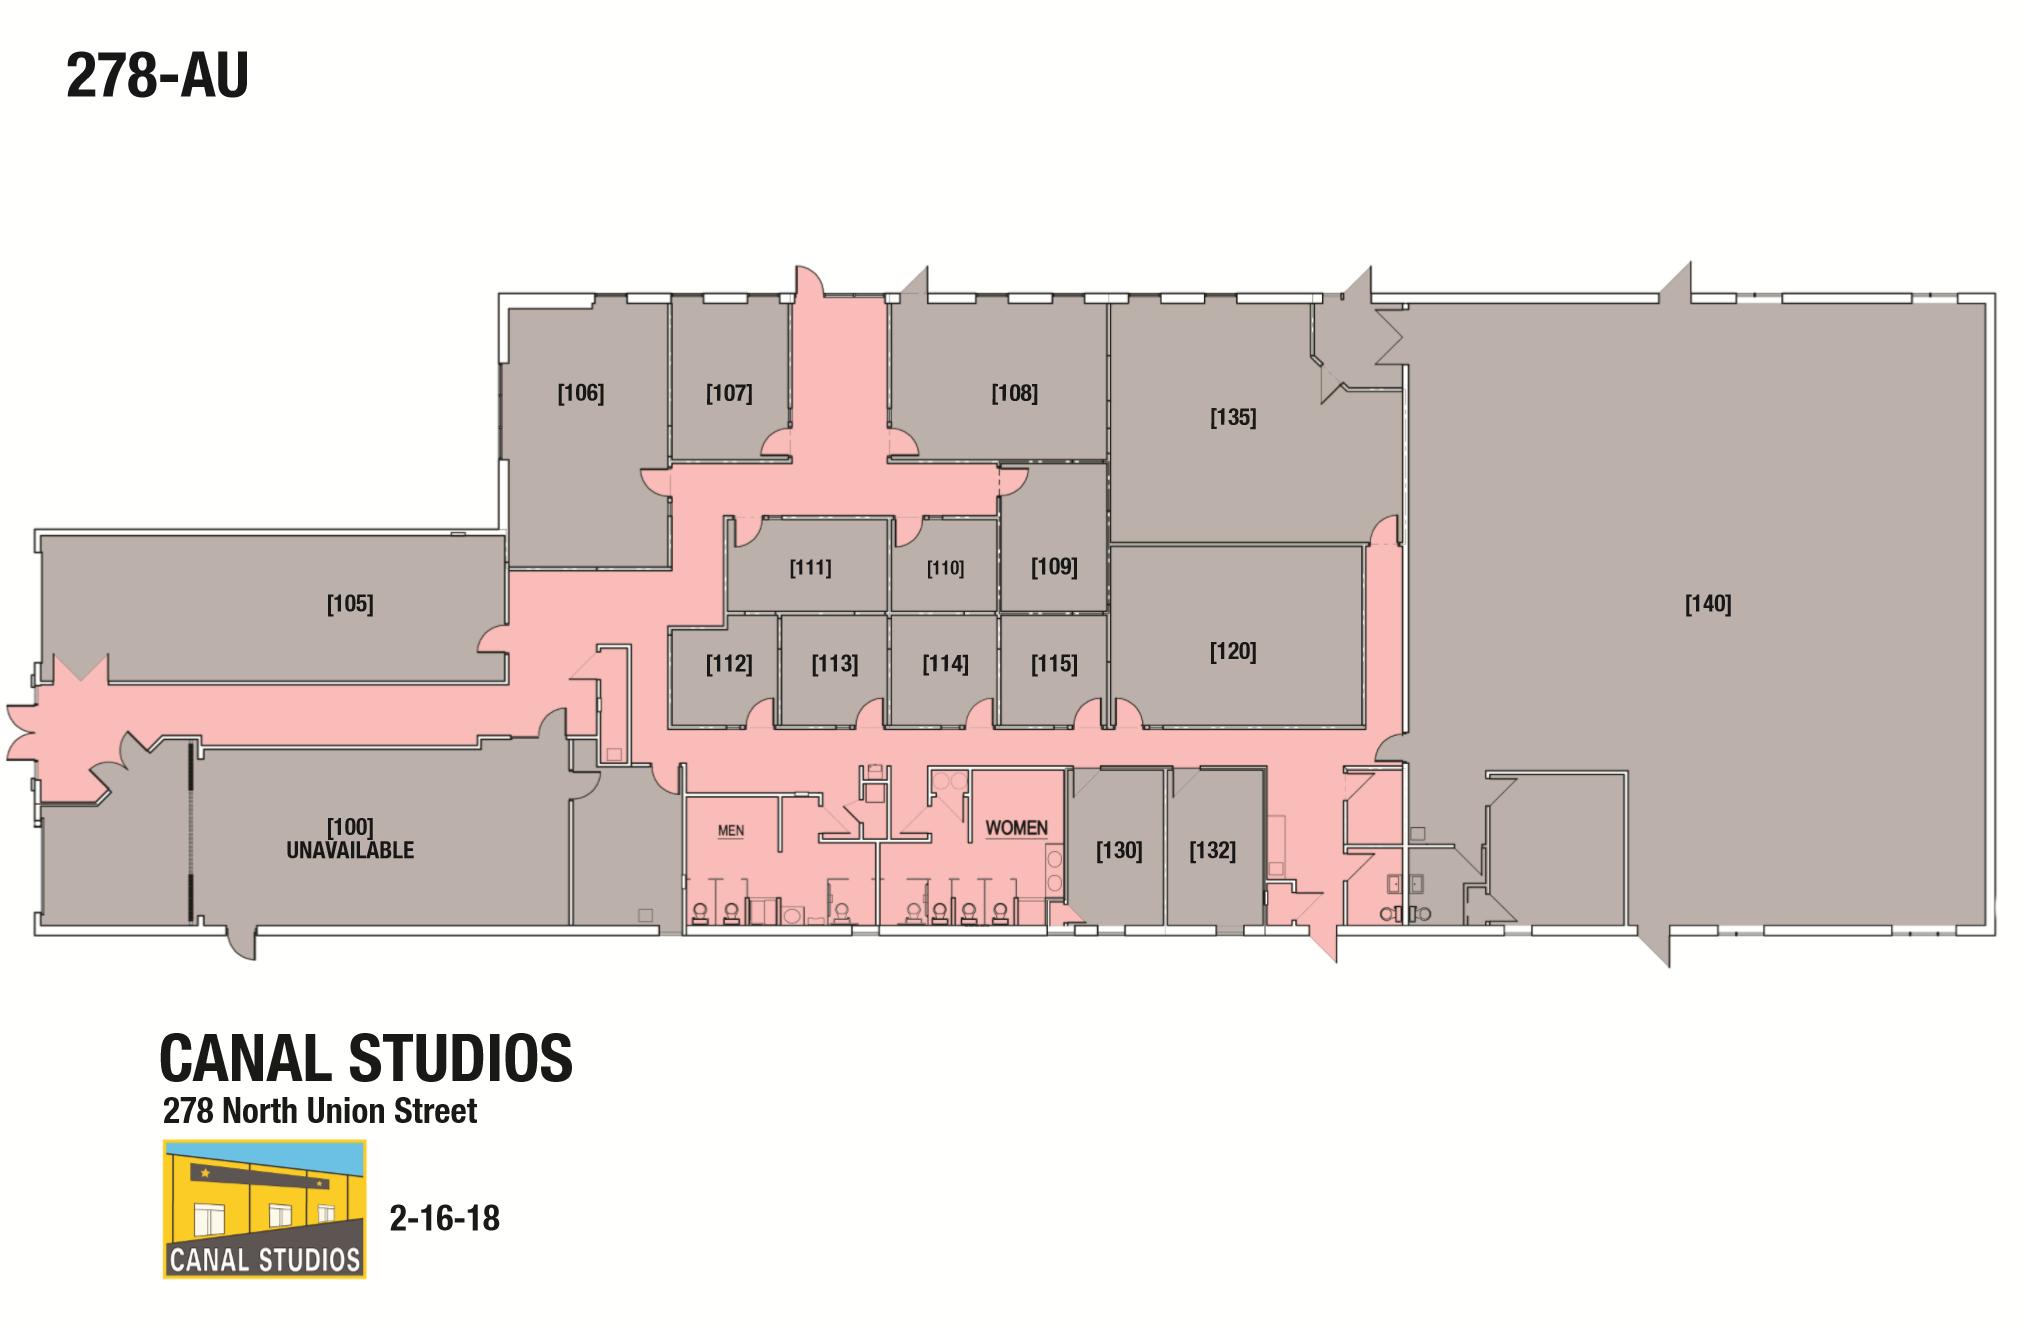 278 North Union Street, Lambertville, NJ 08530 - Canal Rental Suites